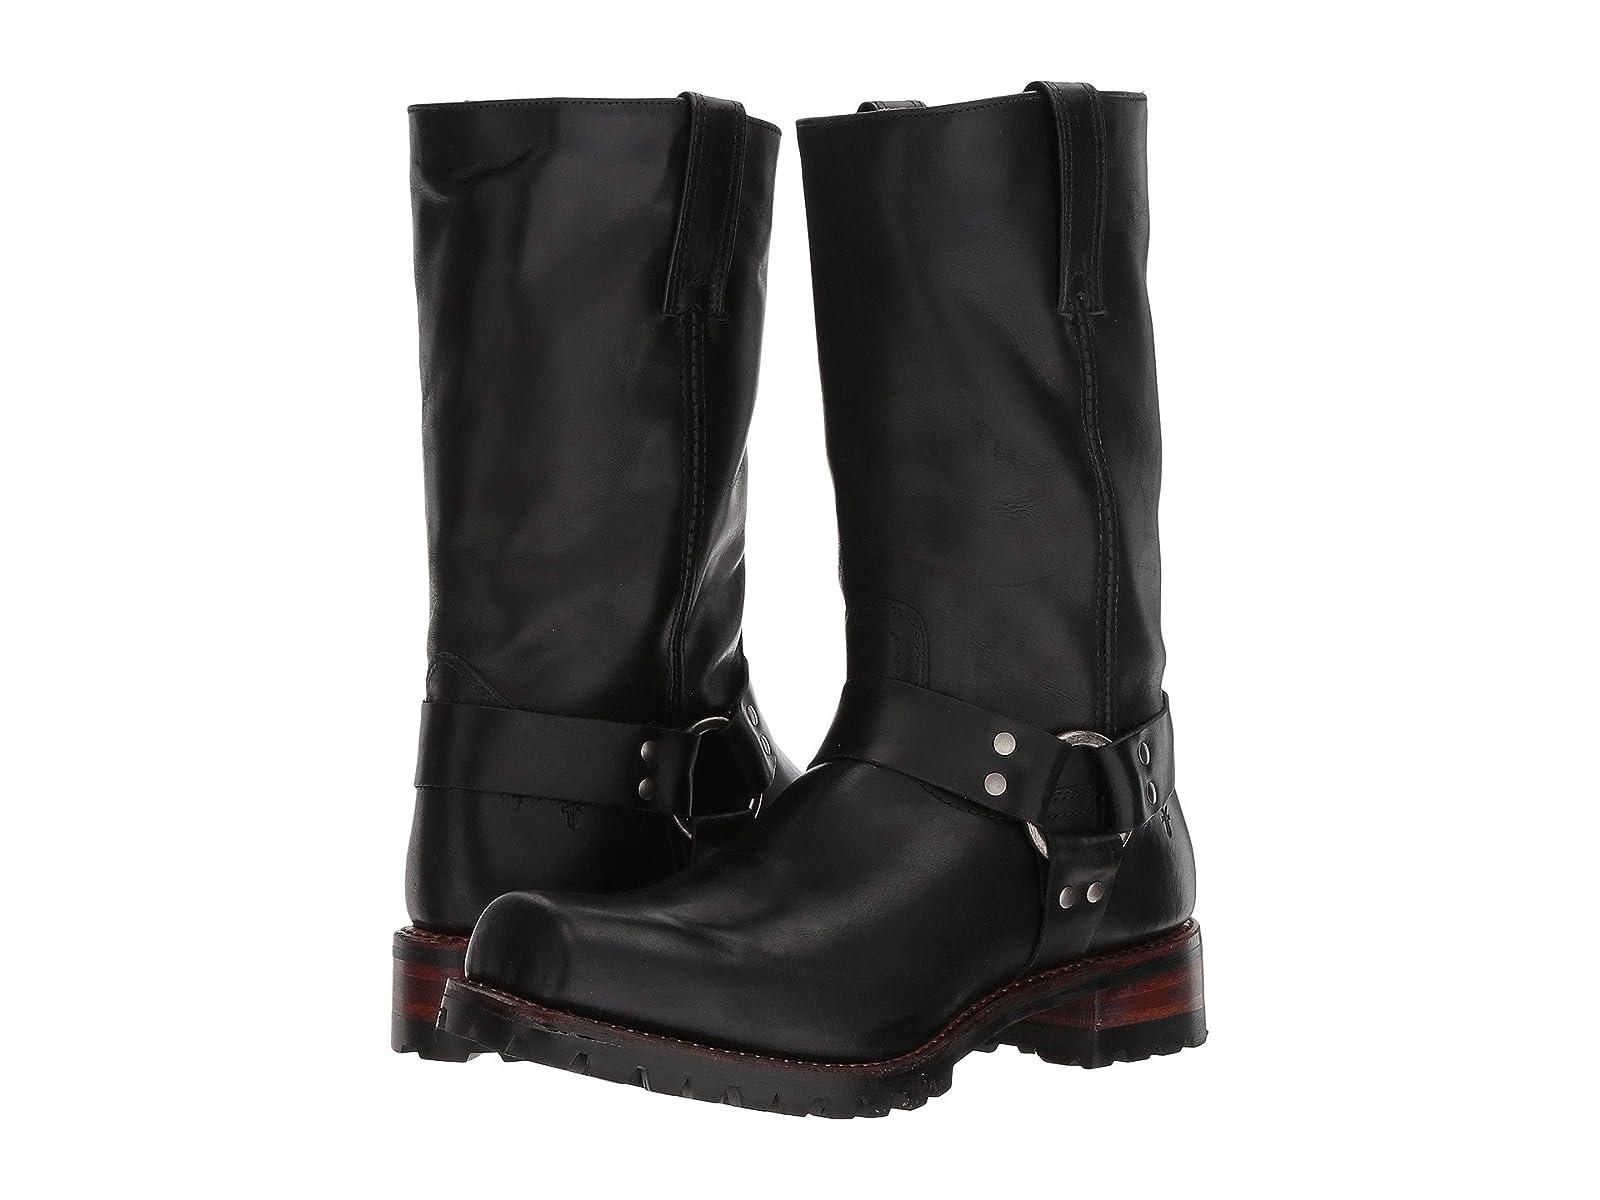 Frye Addison Lug Harness 12RAffordable and distinctive shoes